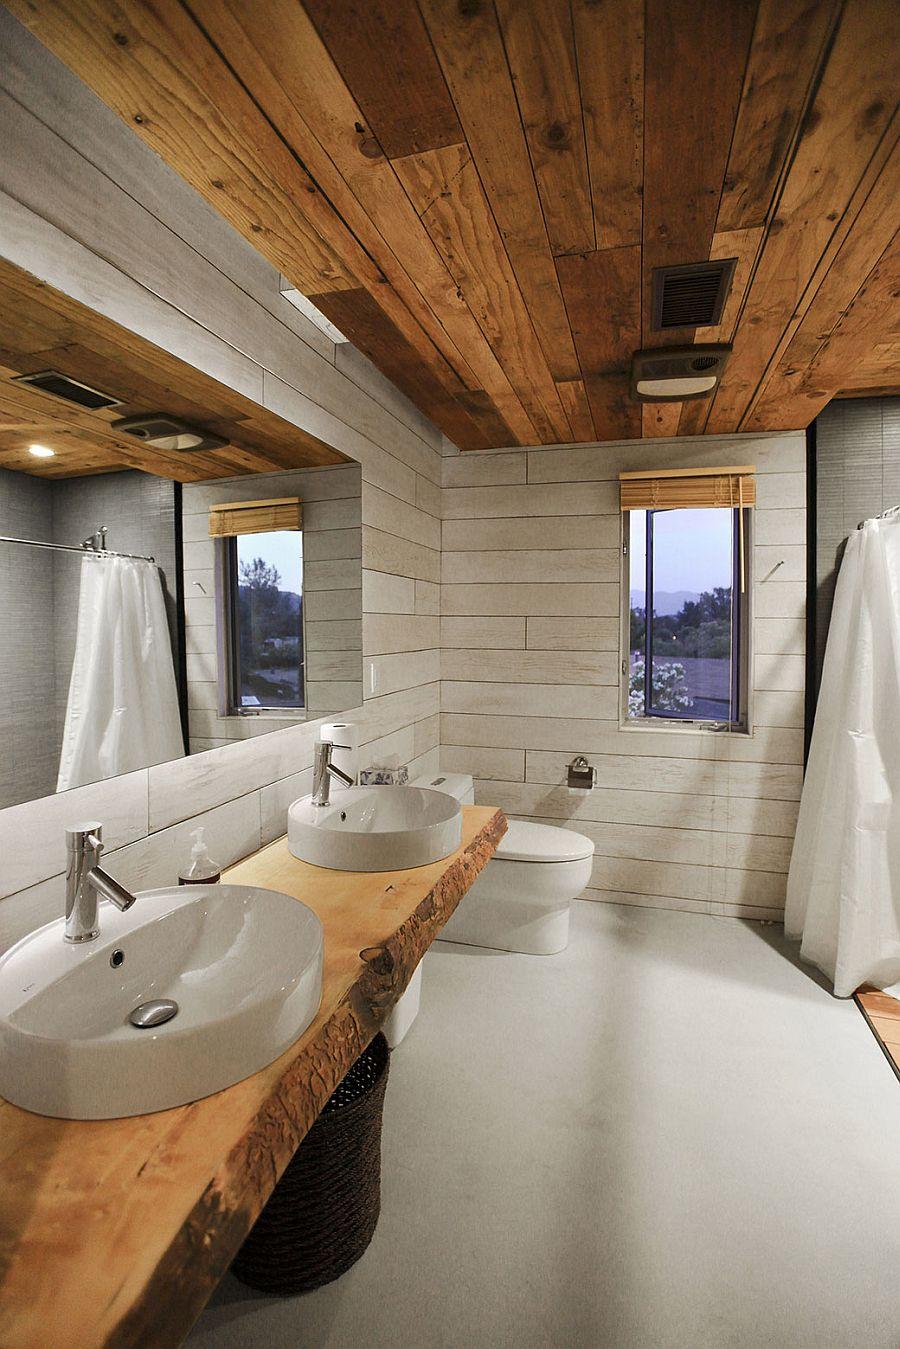 custom 510 cabin celebrates expansive views and exclusive design. Black Bedroom Furniture Sets. Home Design Ideas